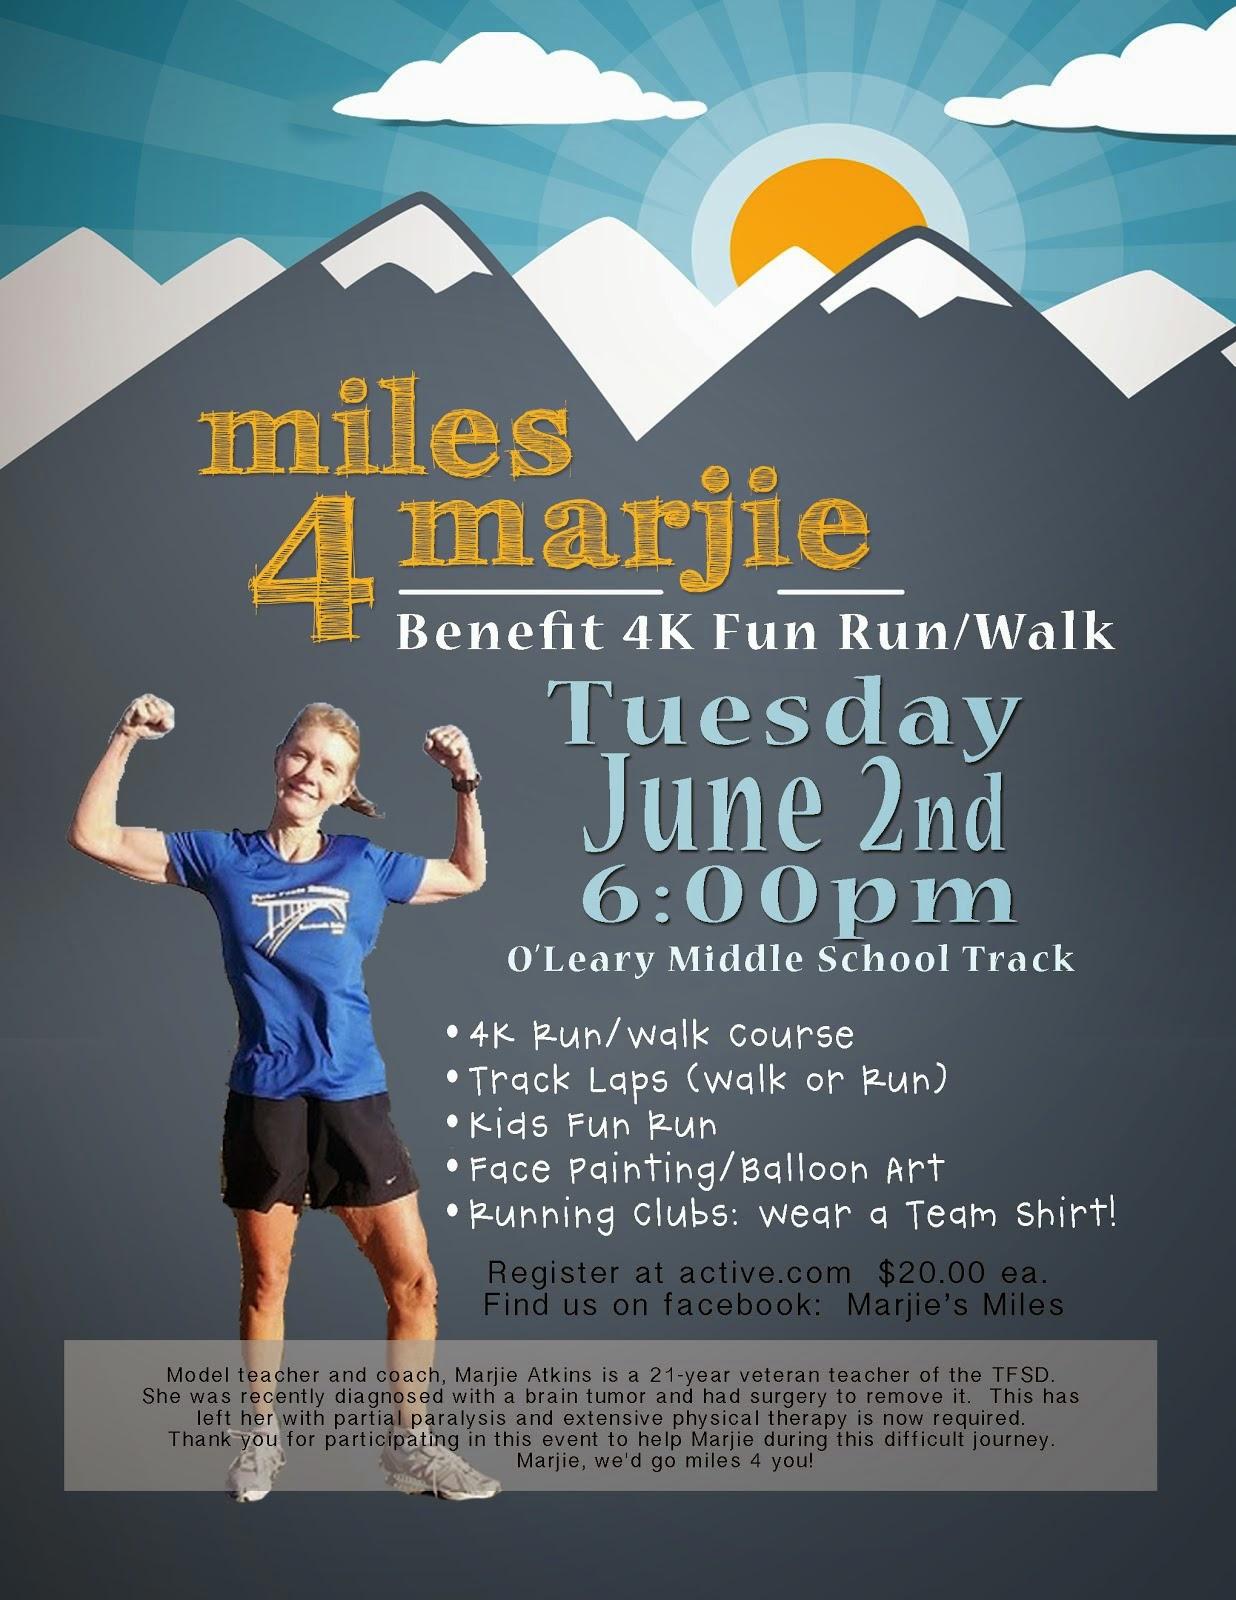 marjie s miles 4k fundraiser